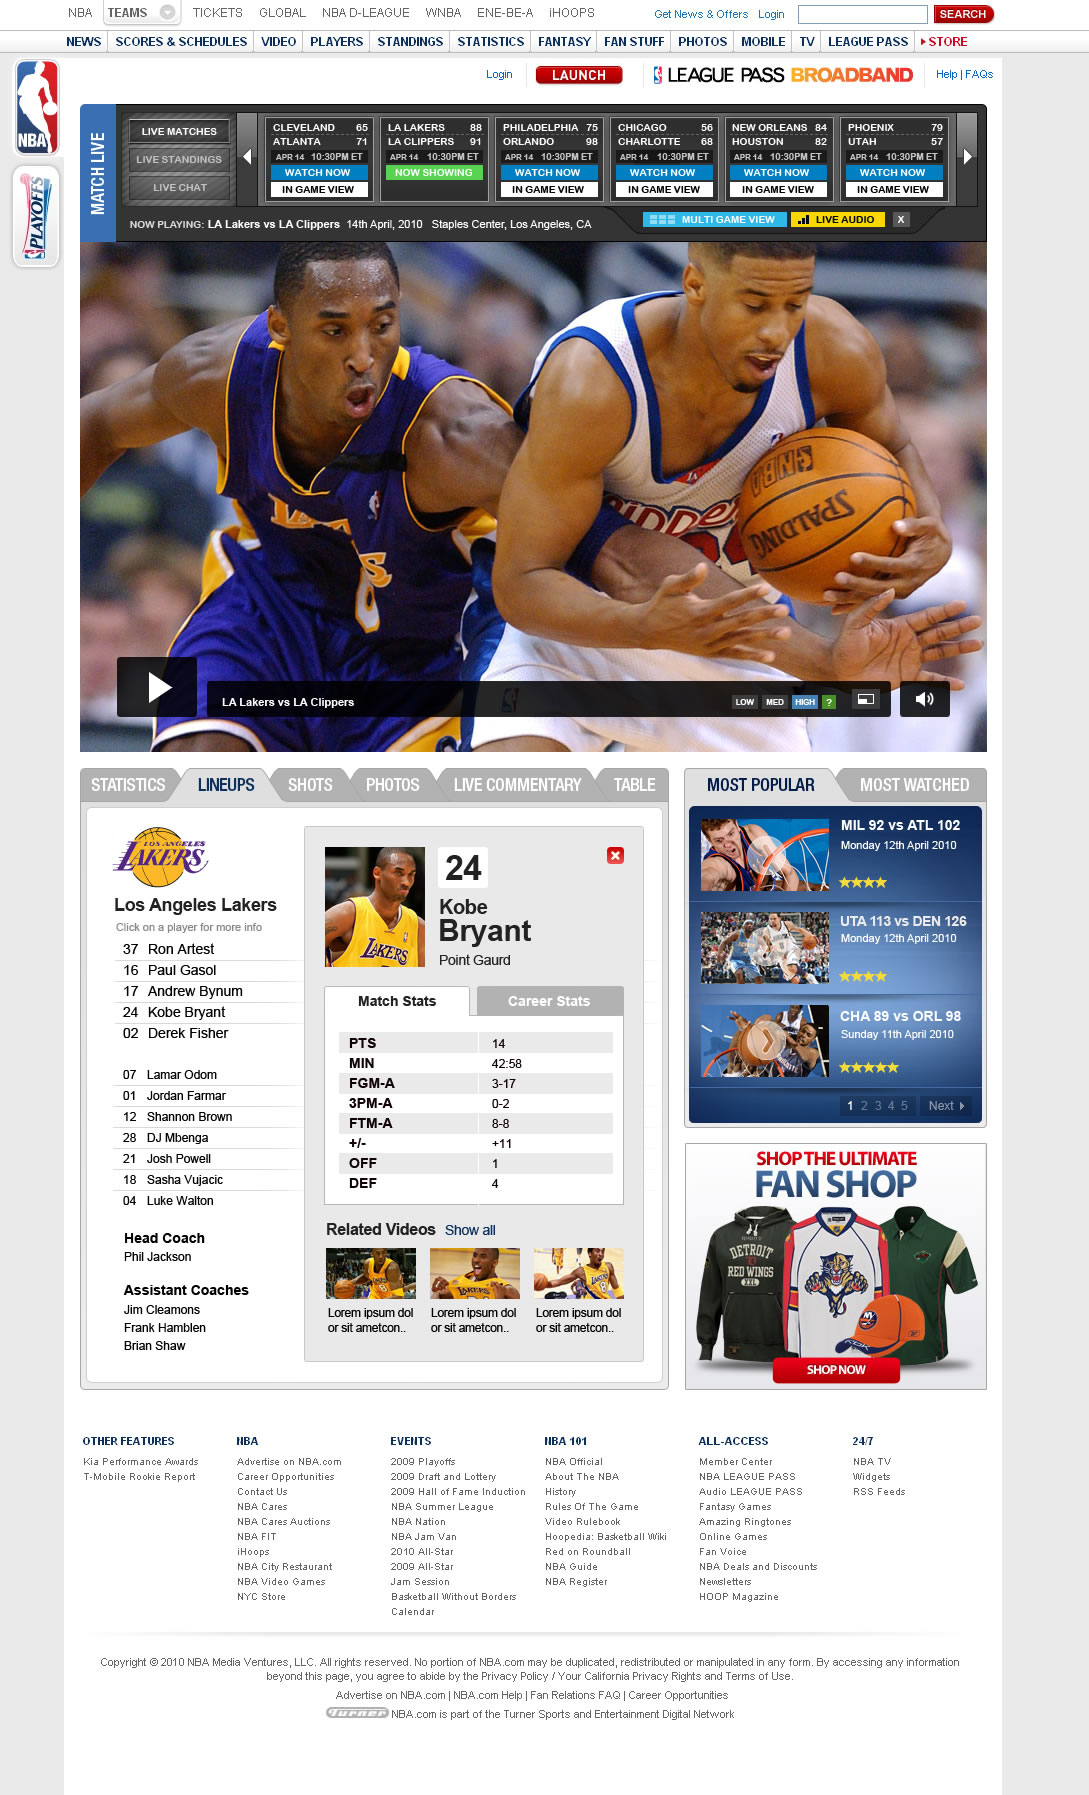 NBA_live_pitch_player_stats